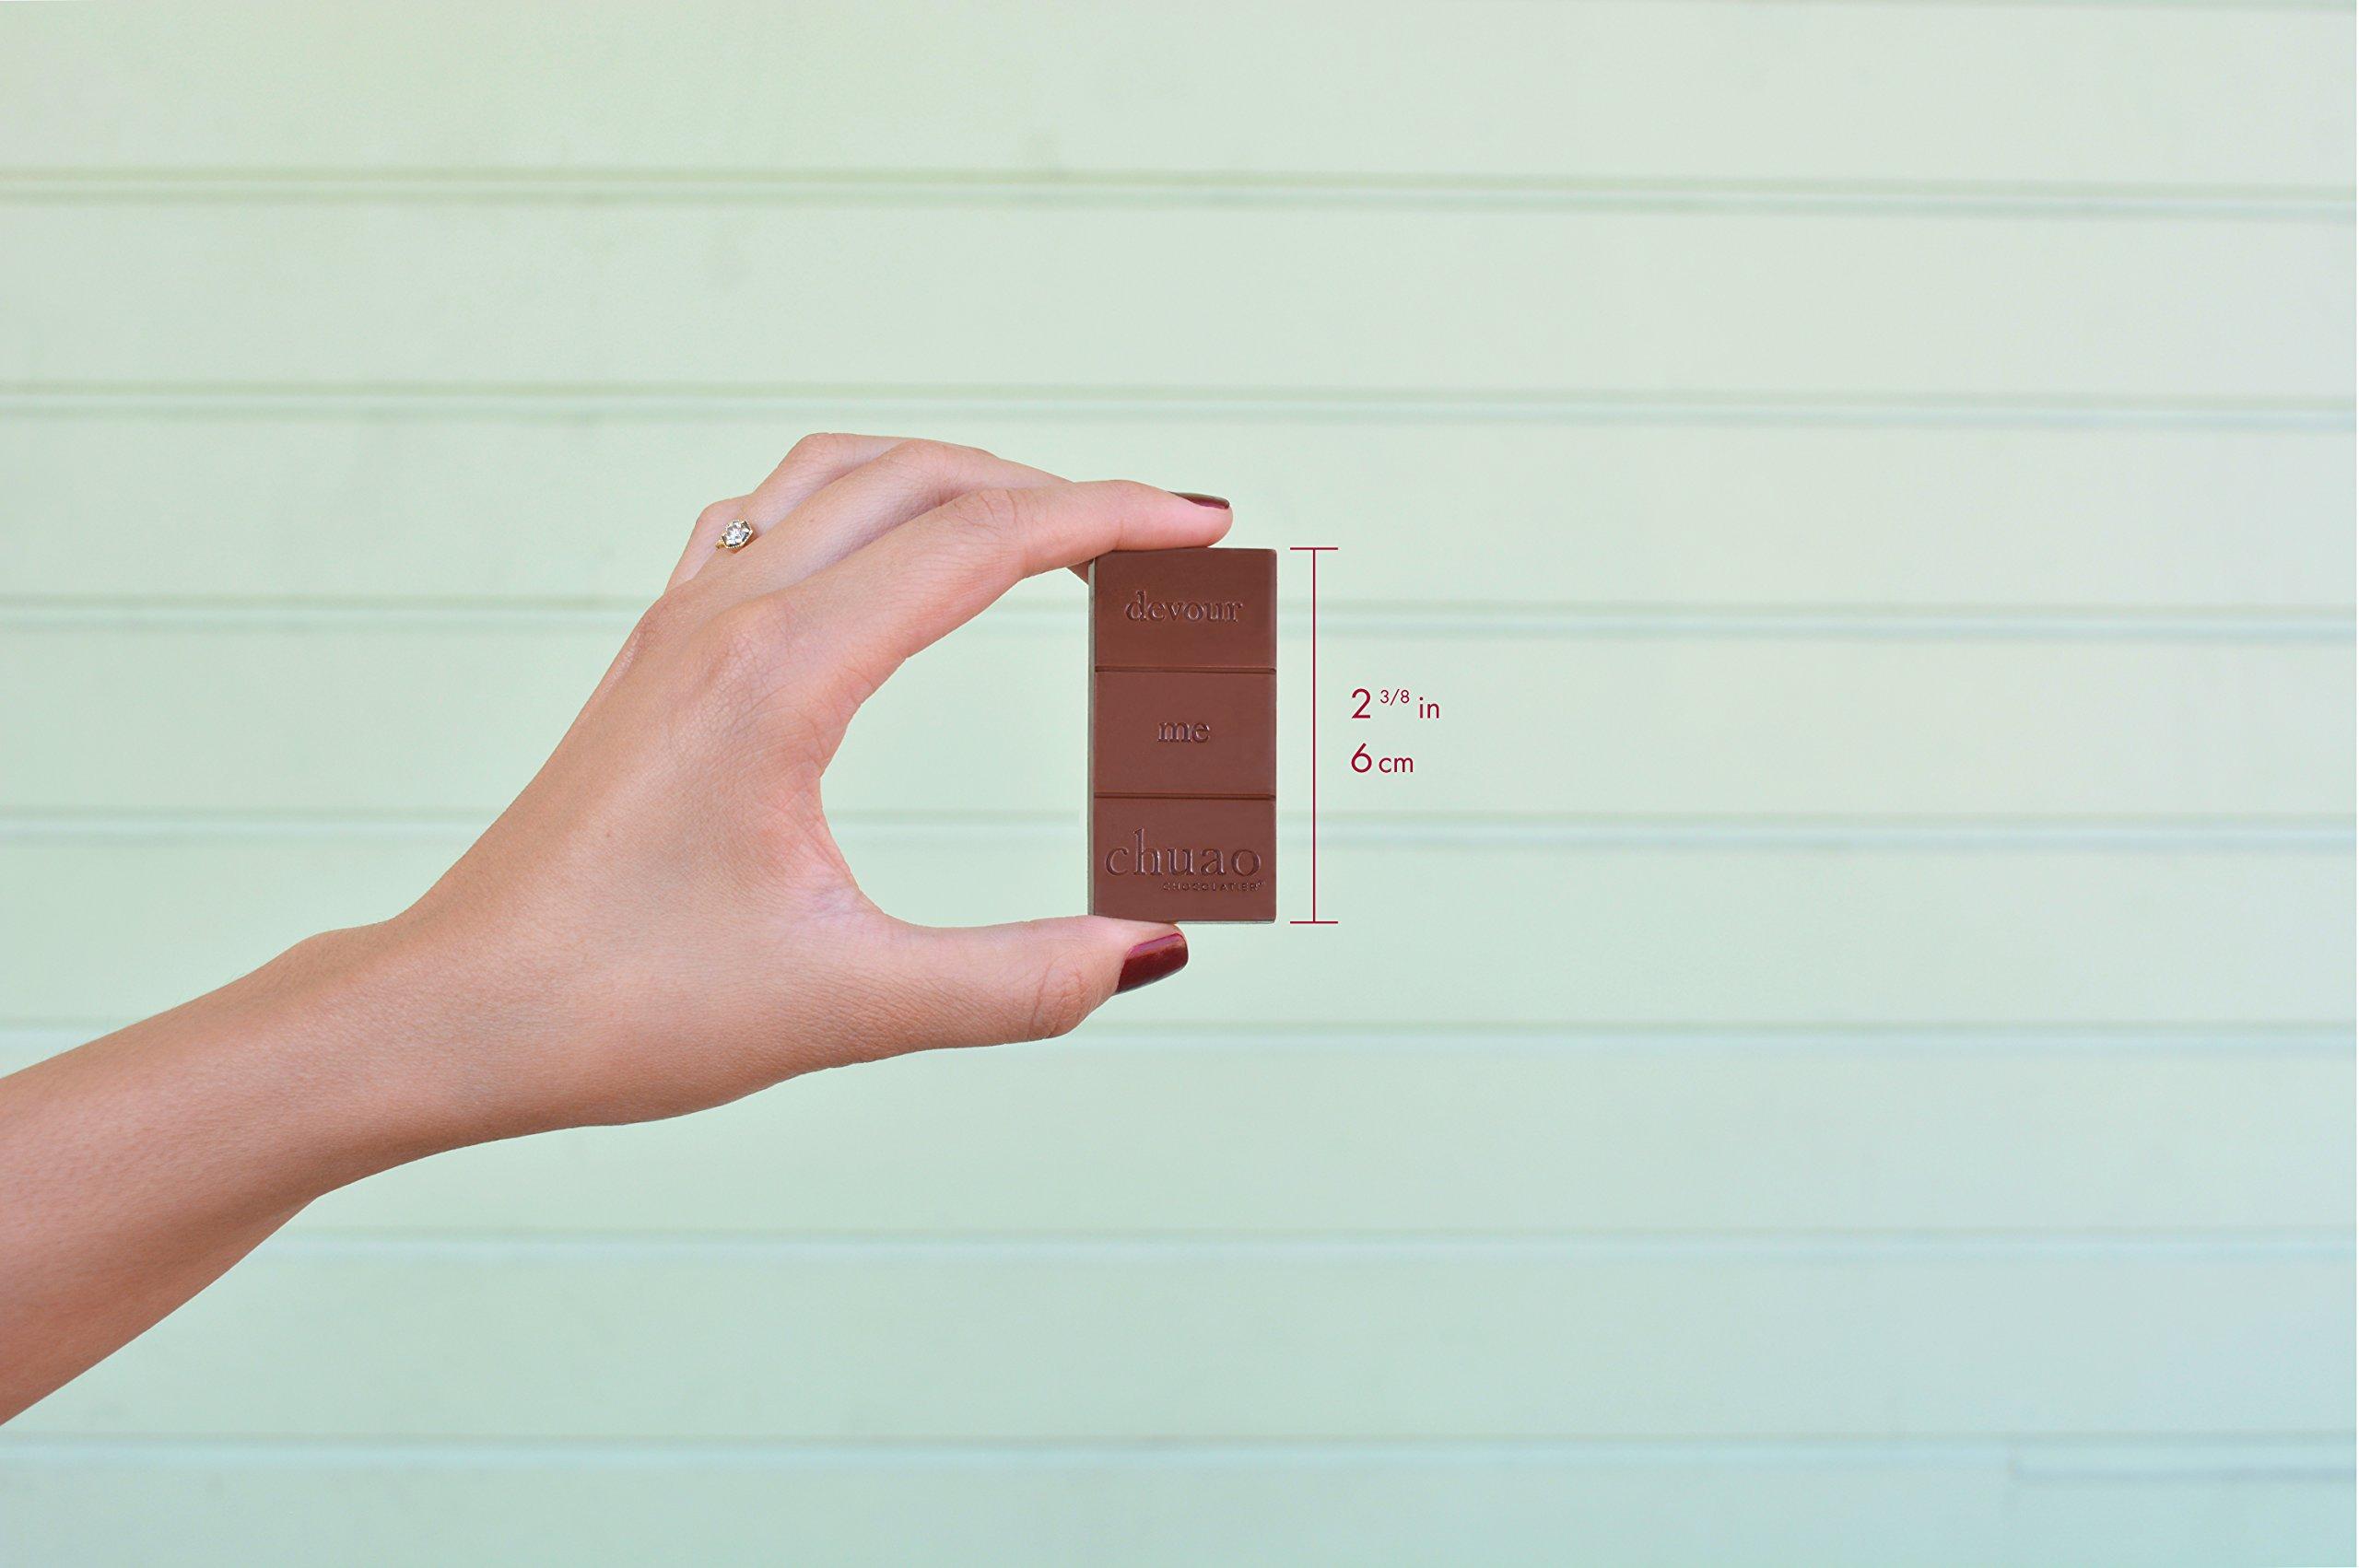 Chuao Chocolatier Share the Love Chocopod Gift Set - Mini Chocolate Bars (36-pack) by Chuao Chocolatier